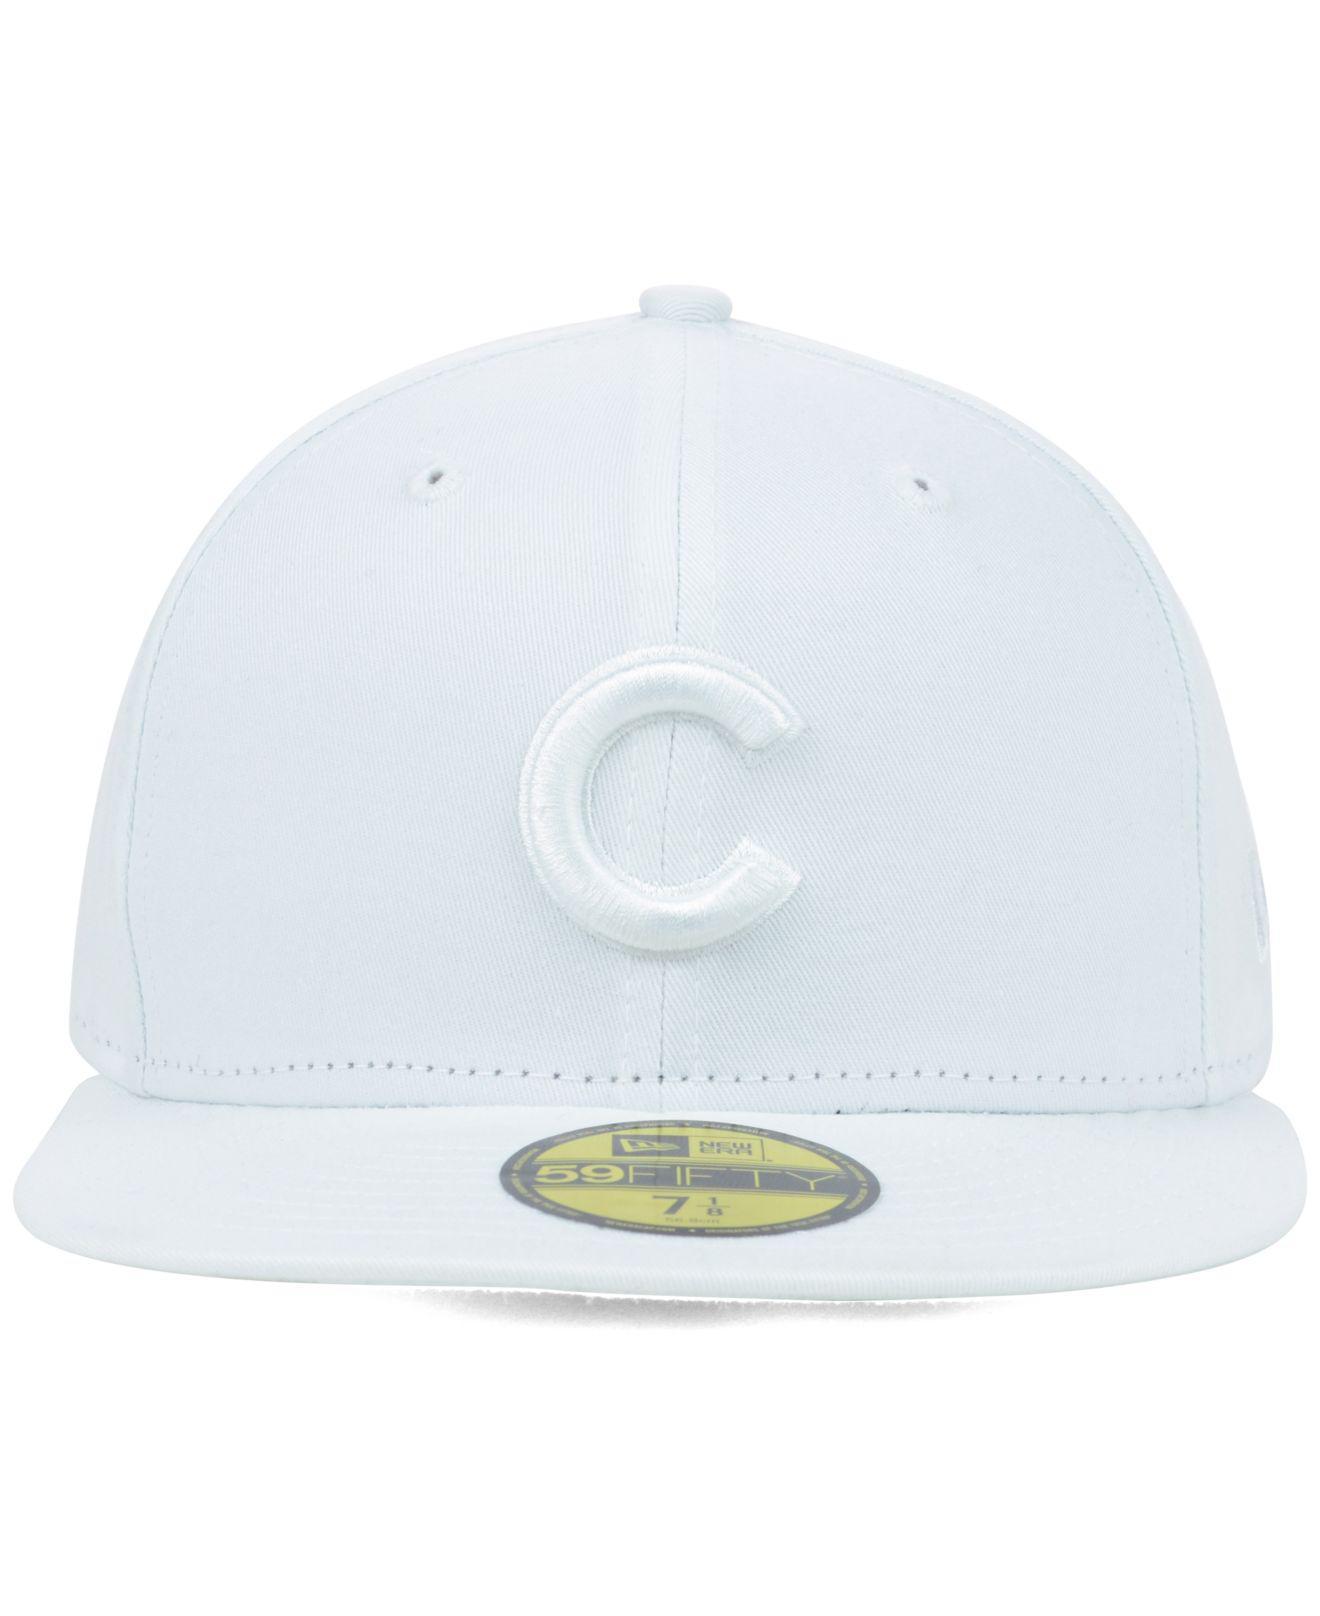 3ef2899c4d0 Lyst - KTZ Chicago Cubs White-on-white 59fifty Cap in White for Men